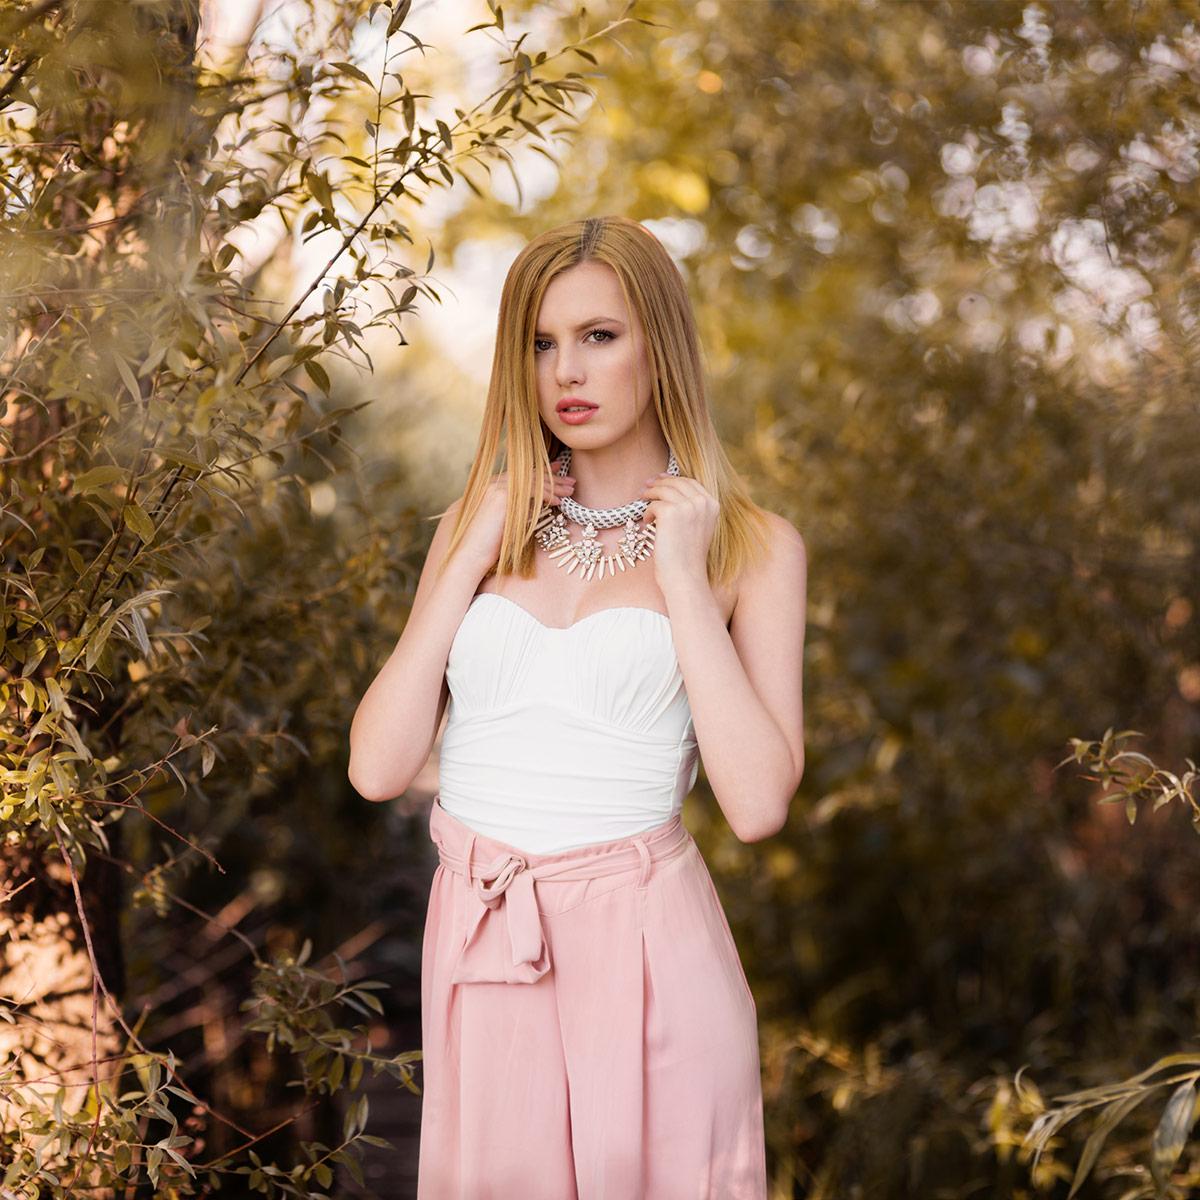 yais-fashion-blog-3